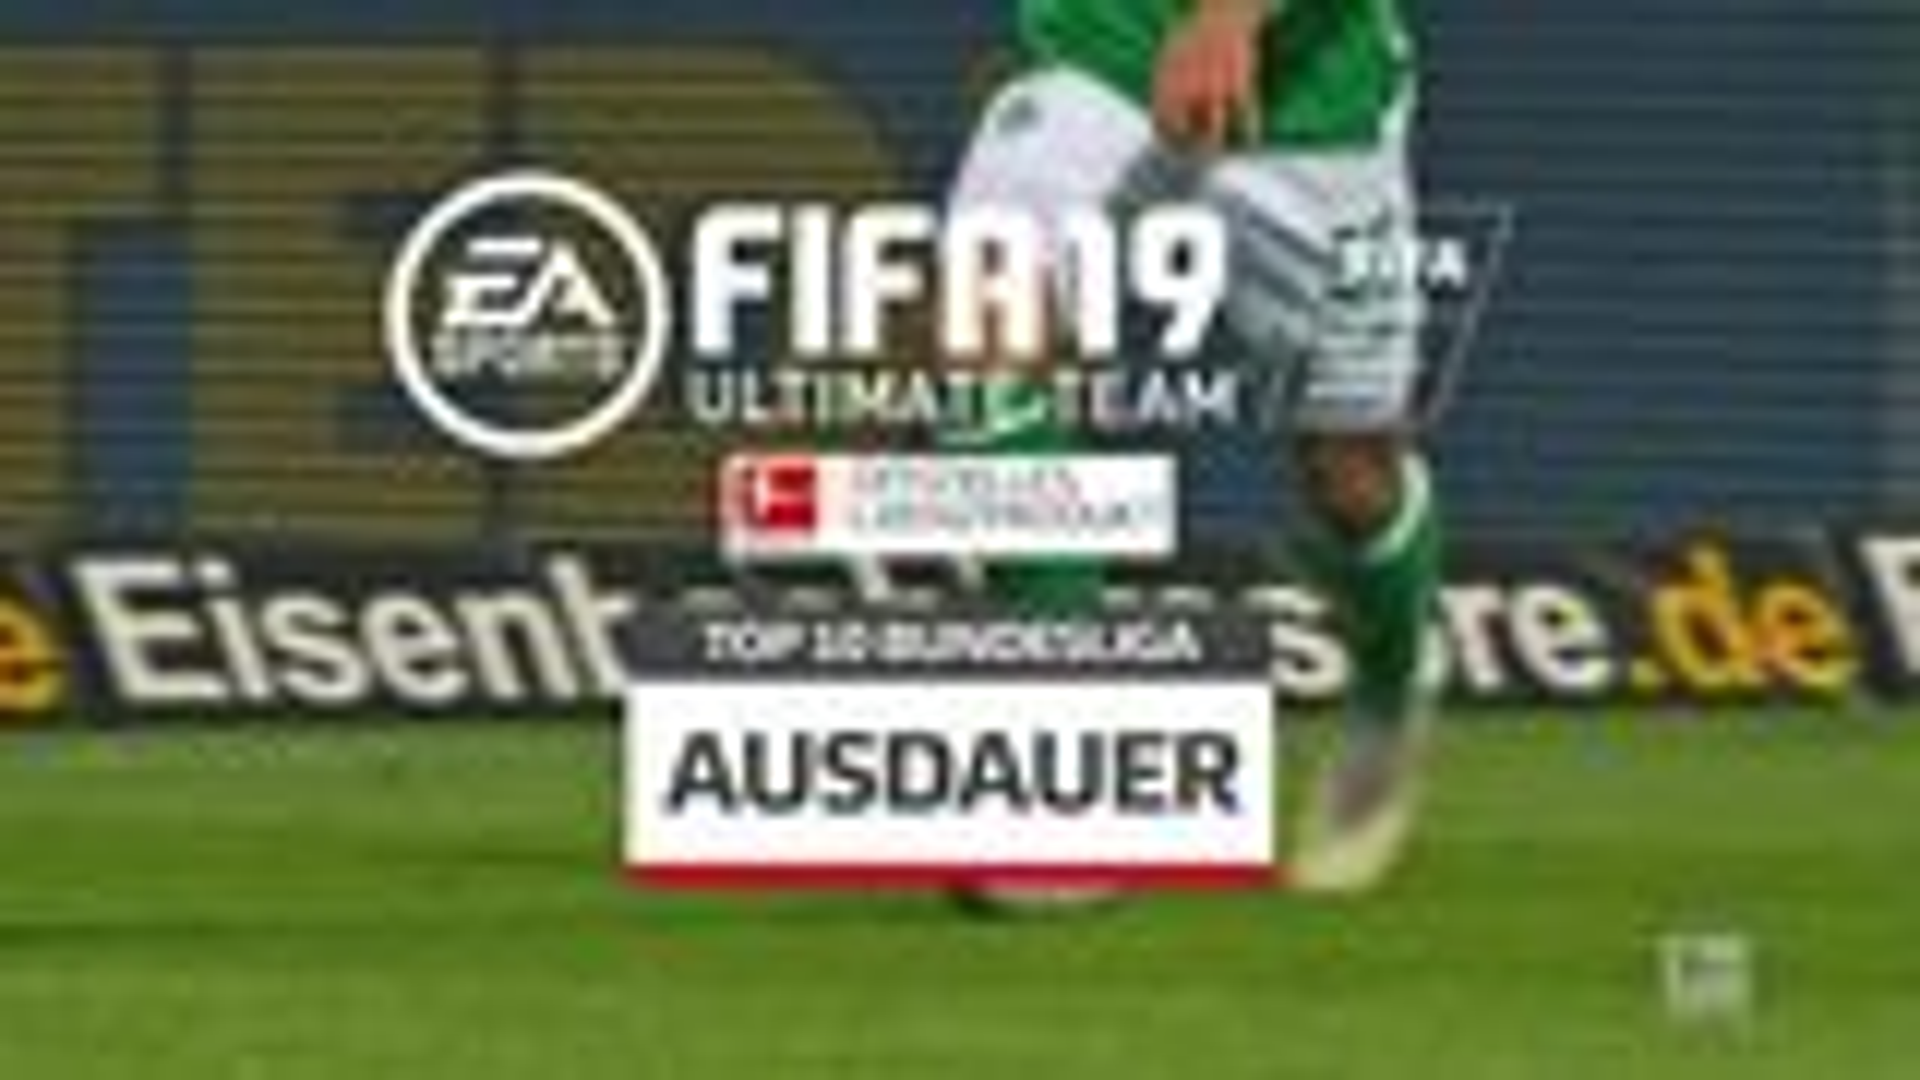 Die Top-10-Bundesliga-Dauerläufer bei FIFA 19